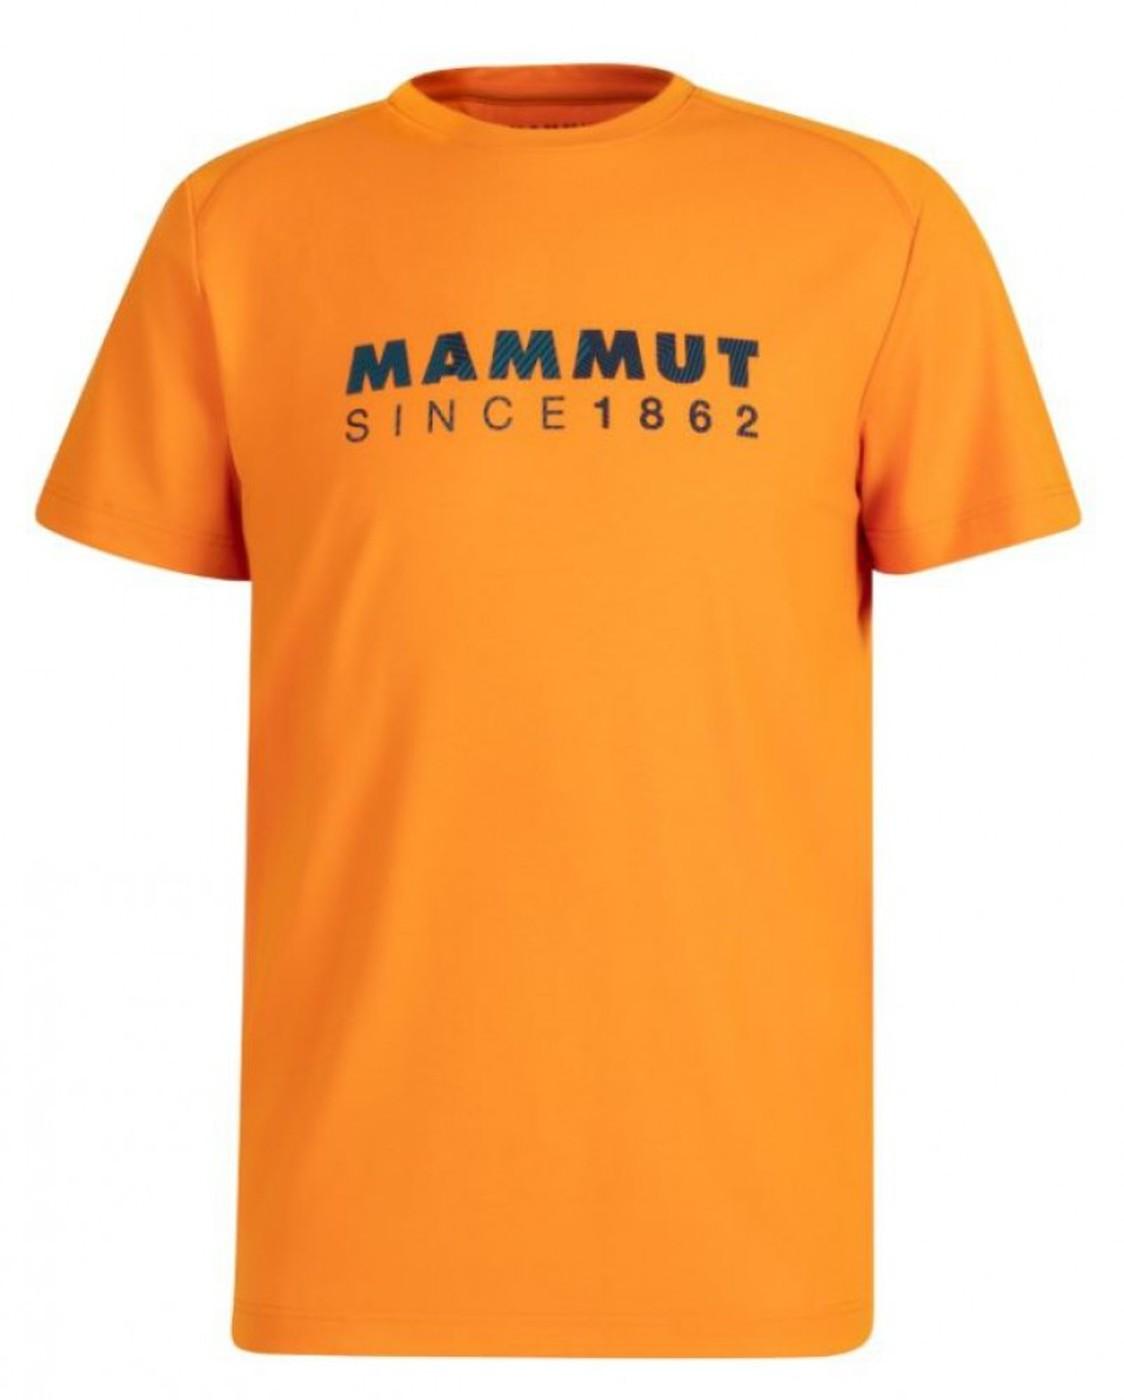 MAMMUT TROVAT T-SHIRT - Herren